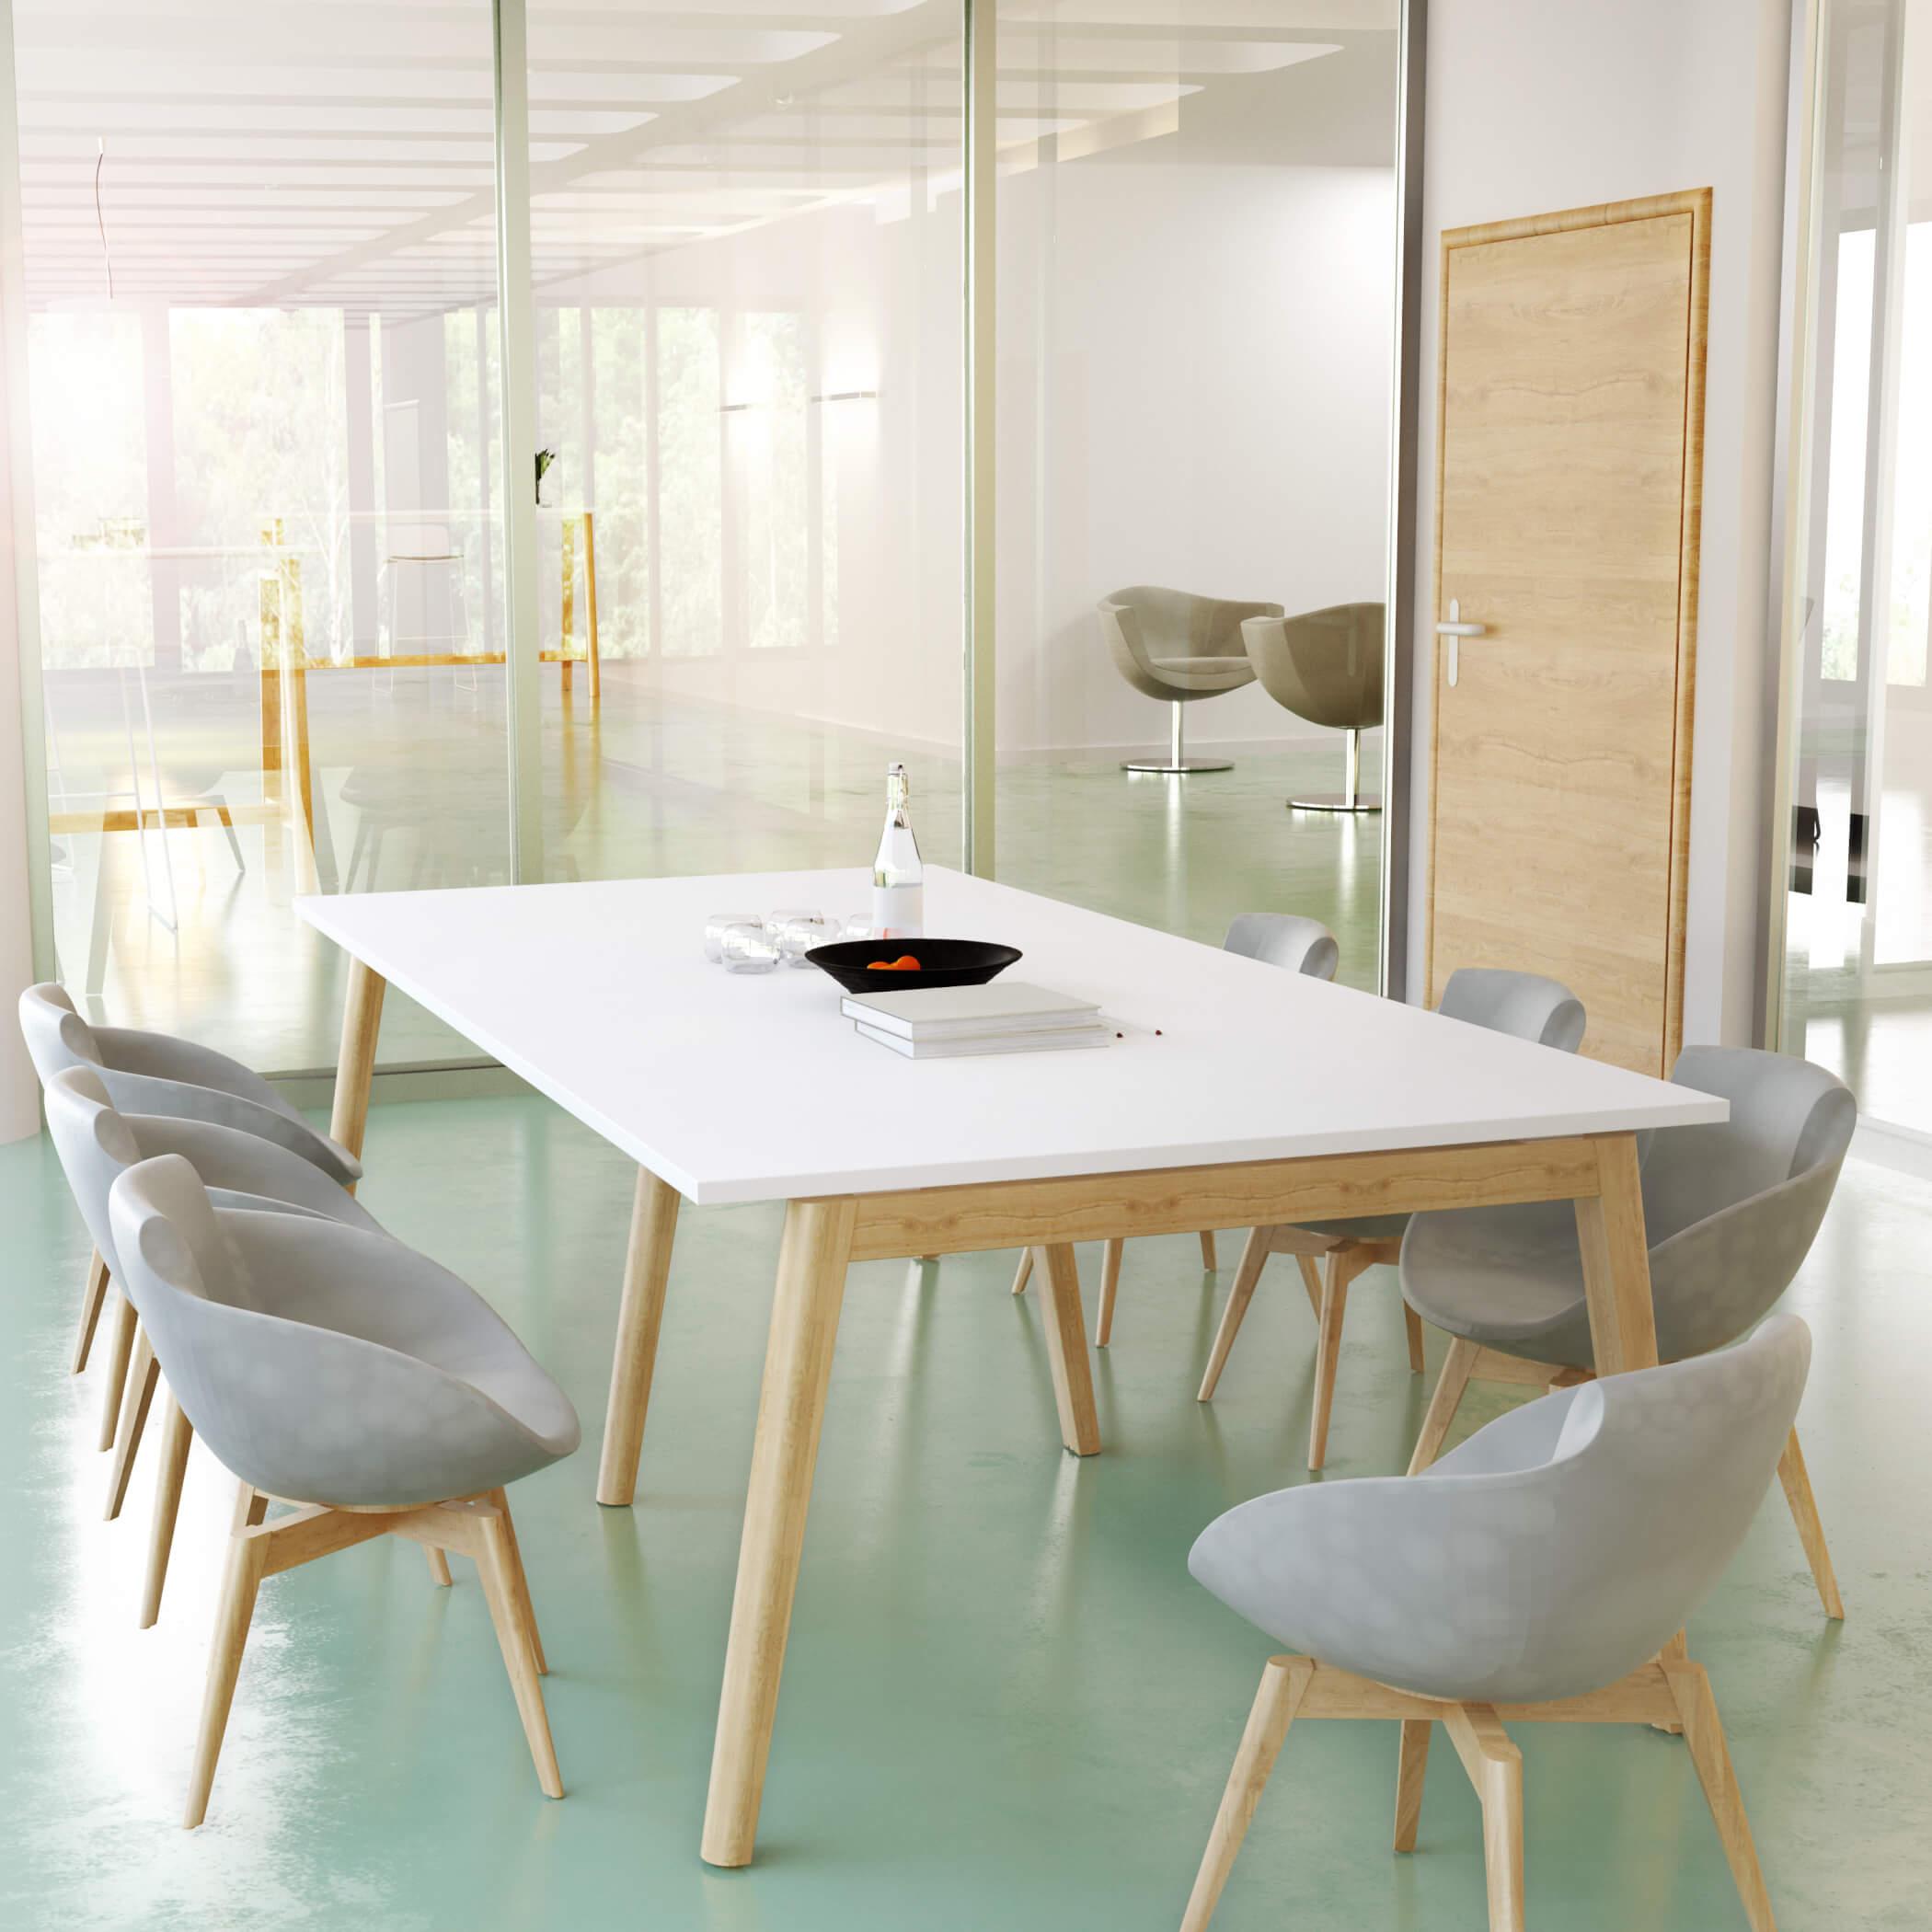 Konferenztisch NOVA Wood 240 x 120 cm Weiß/Holz Meeting Bürotisch